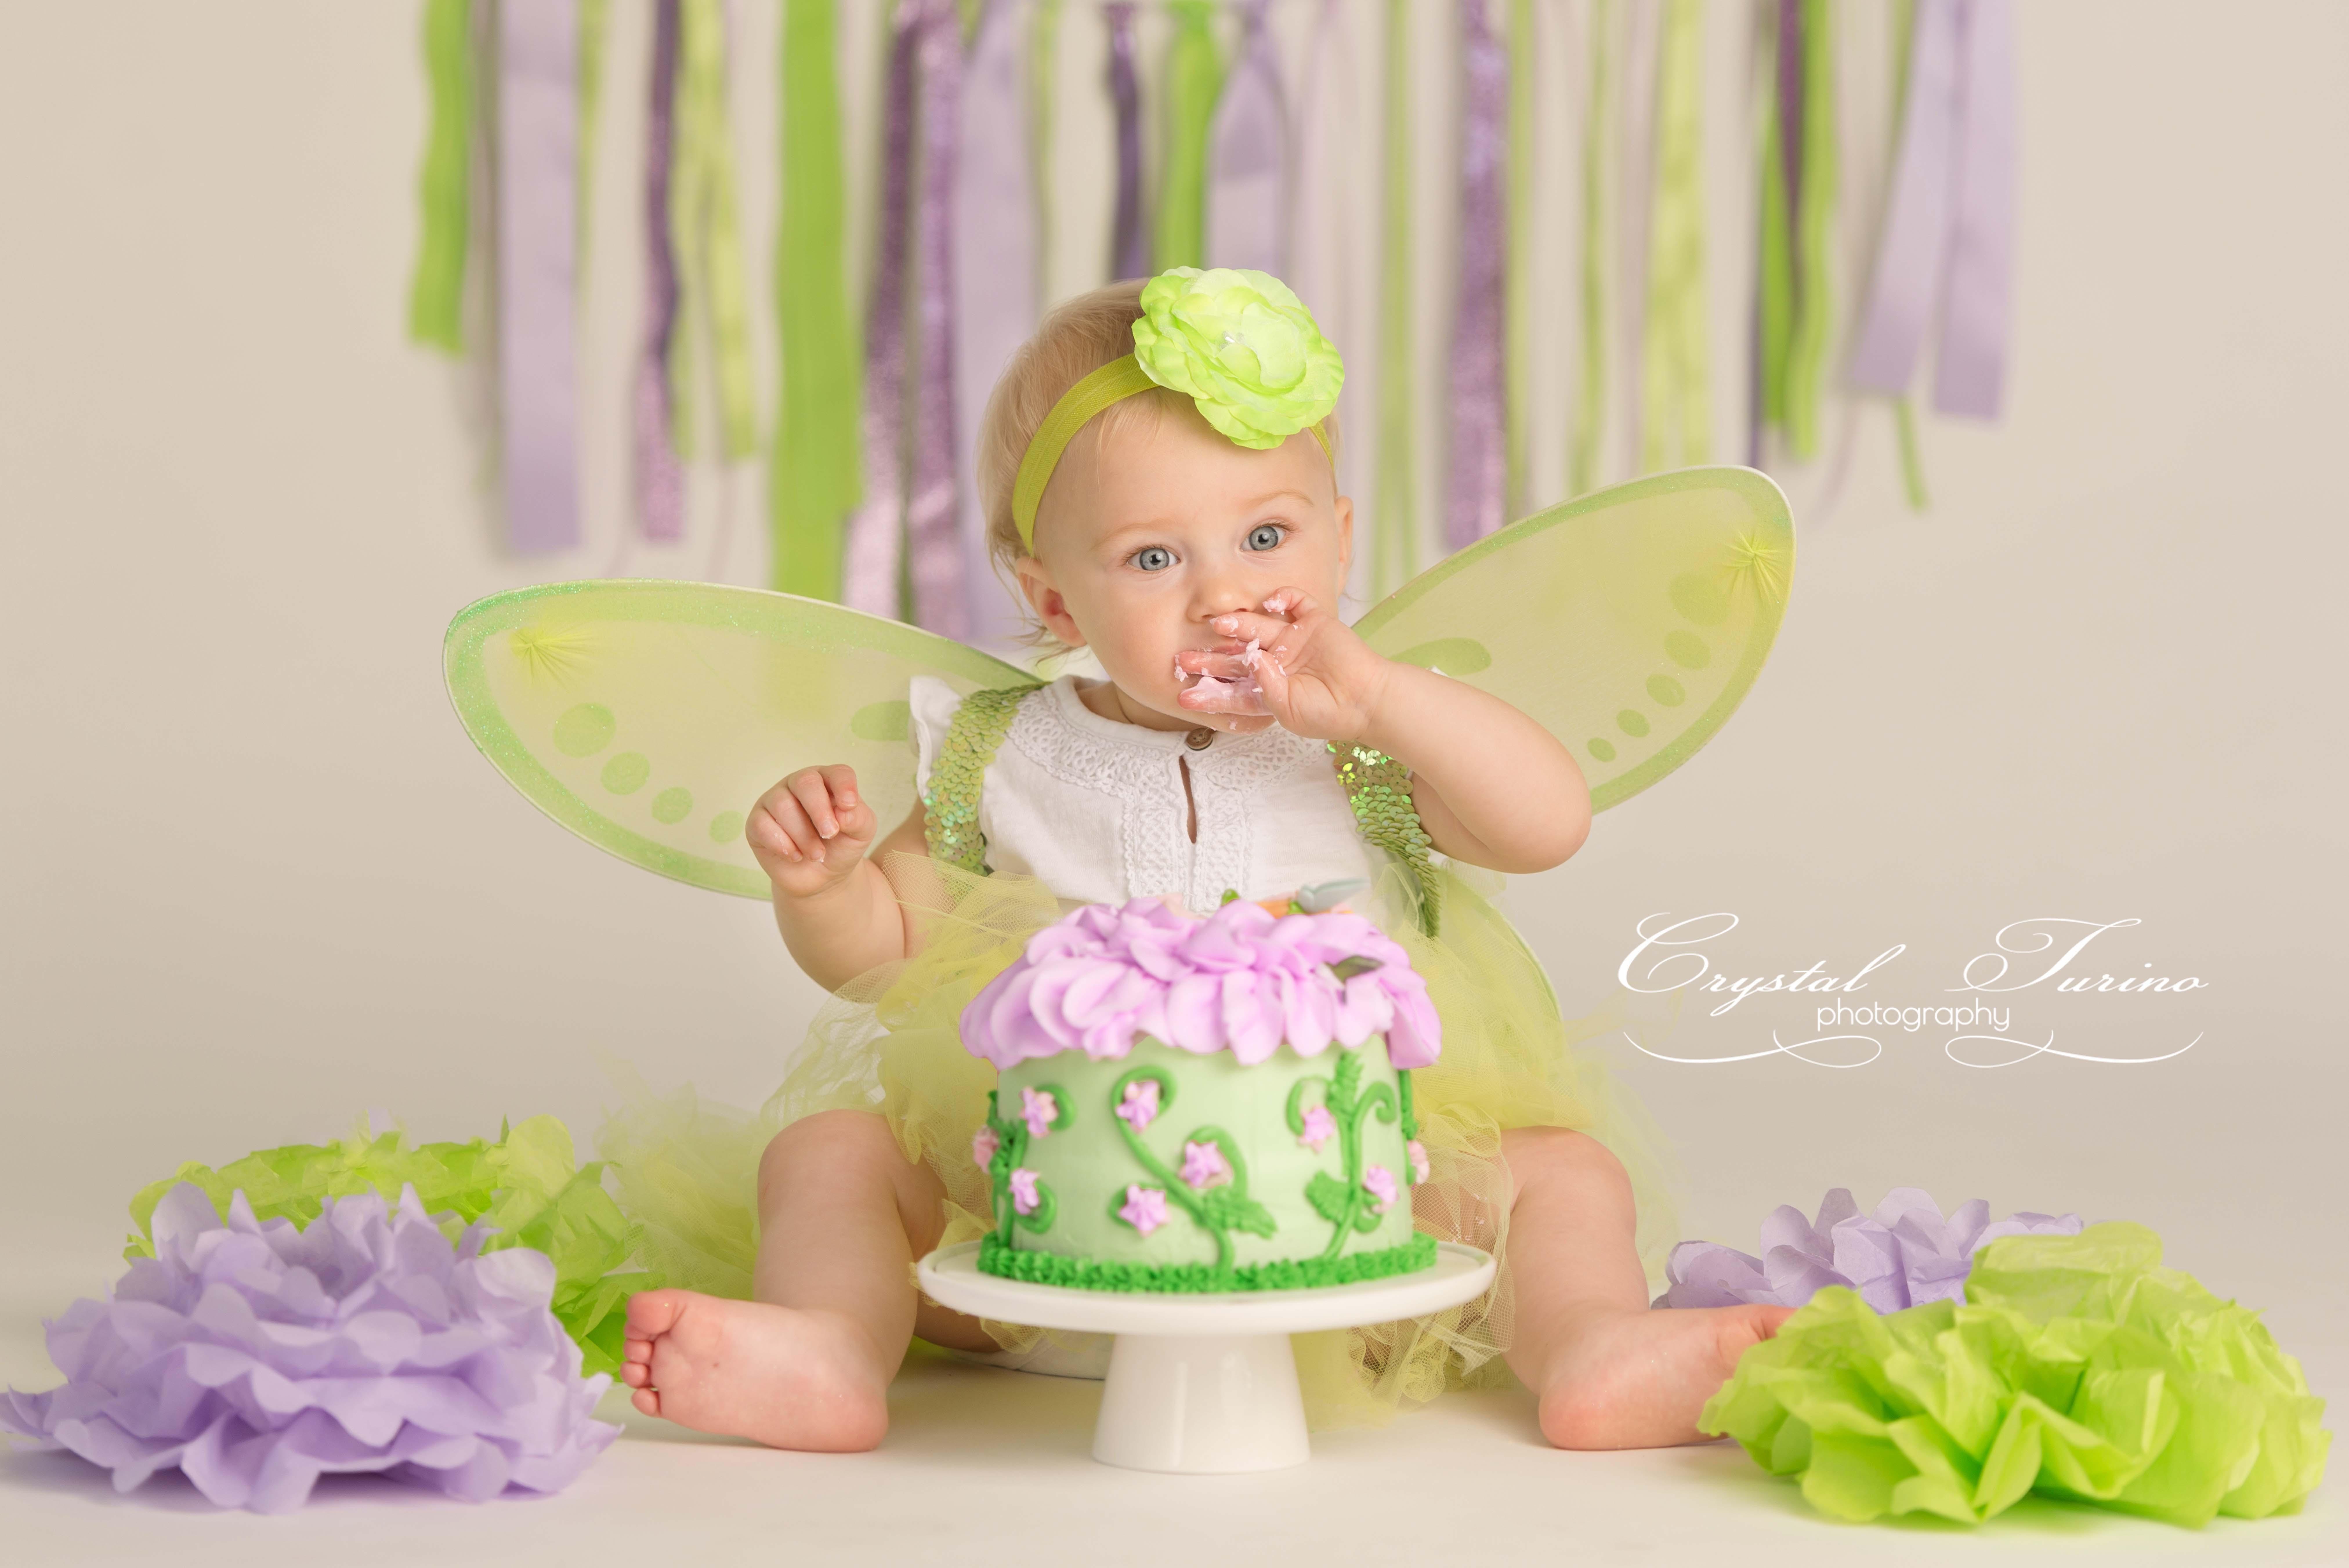 Surprising 1St Birthday Cake Smash Photography Session Albany Ny Funny Birthday Cards Online Aeocydamsfinfo